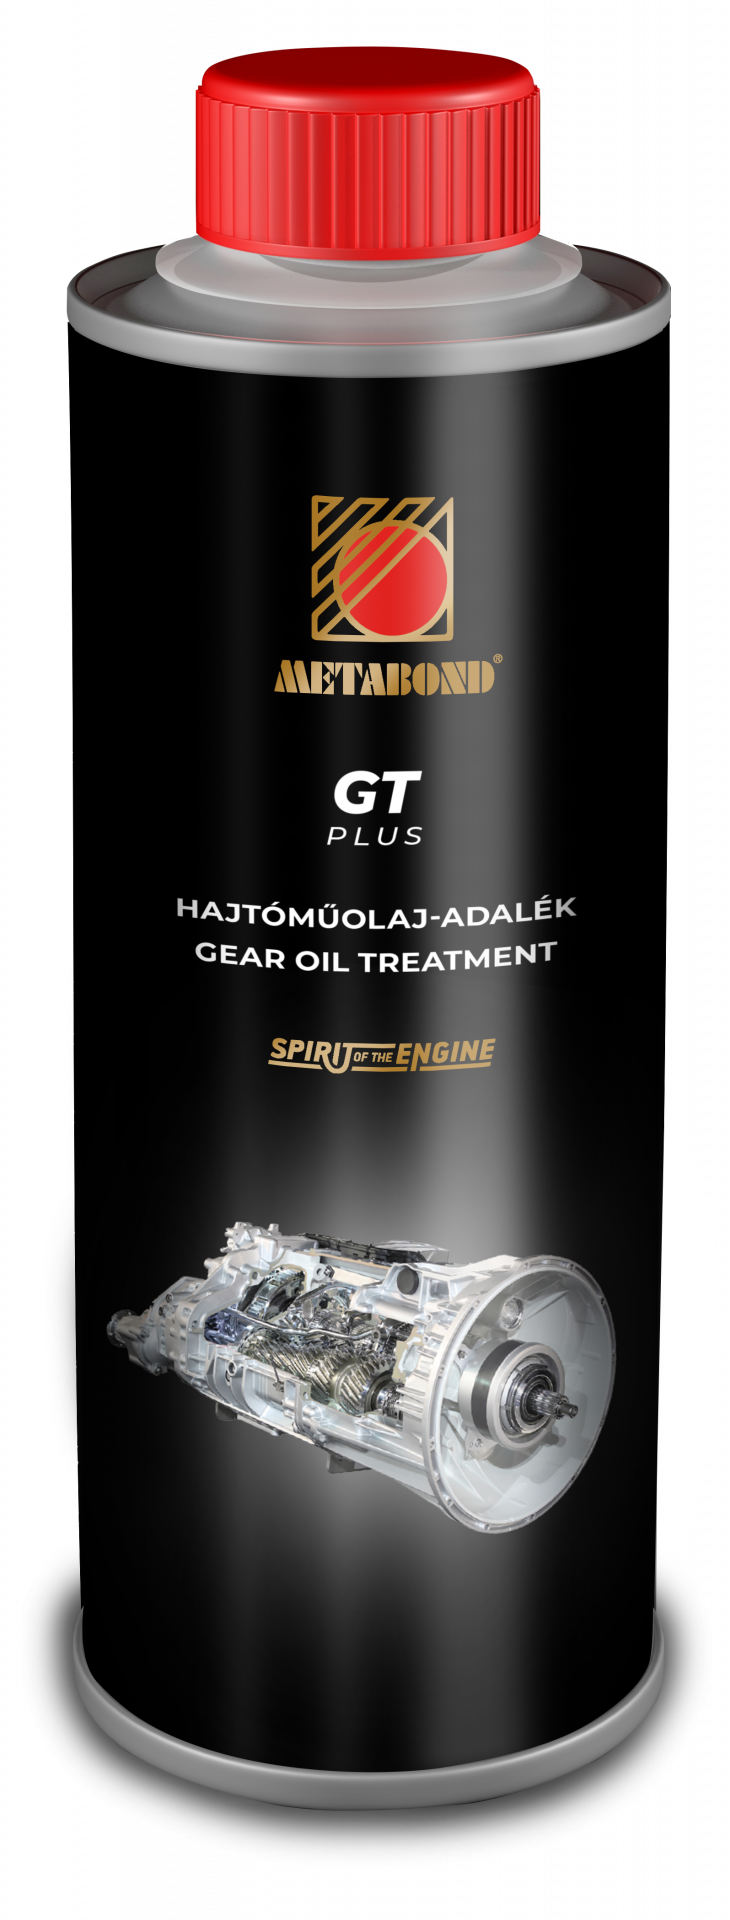 Adalék Metabond GT PLUS 250ML